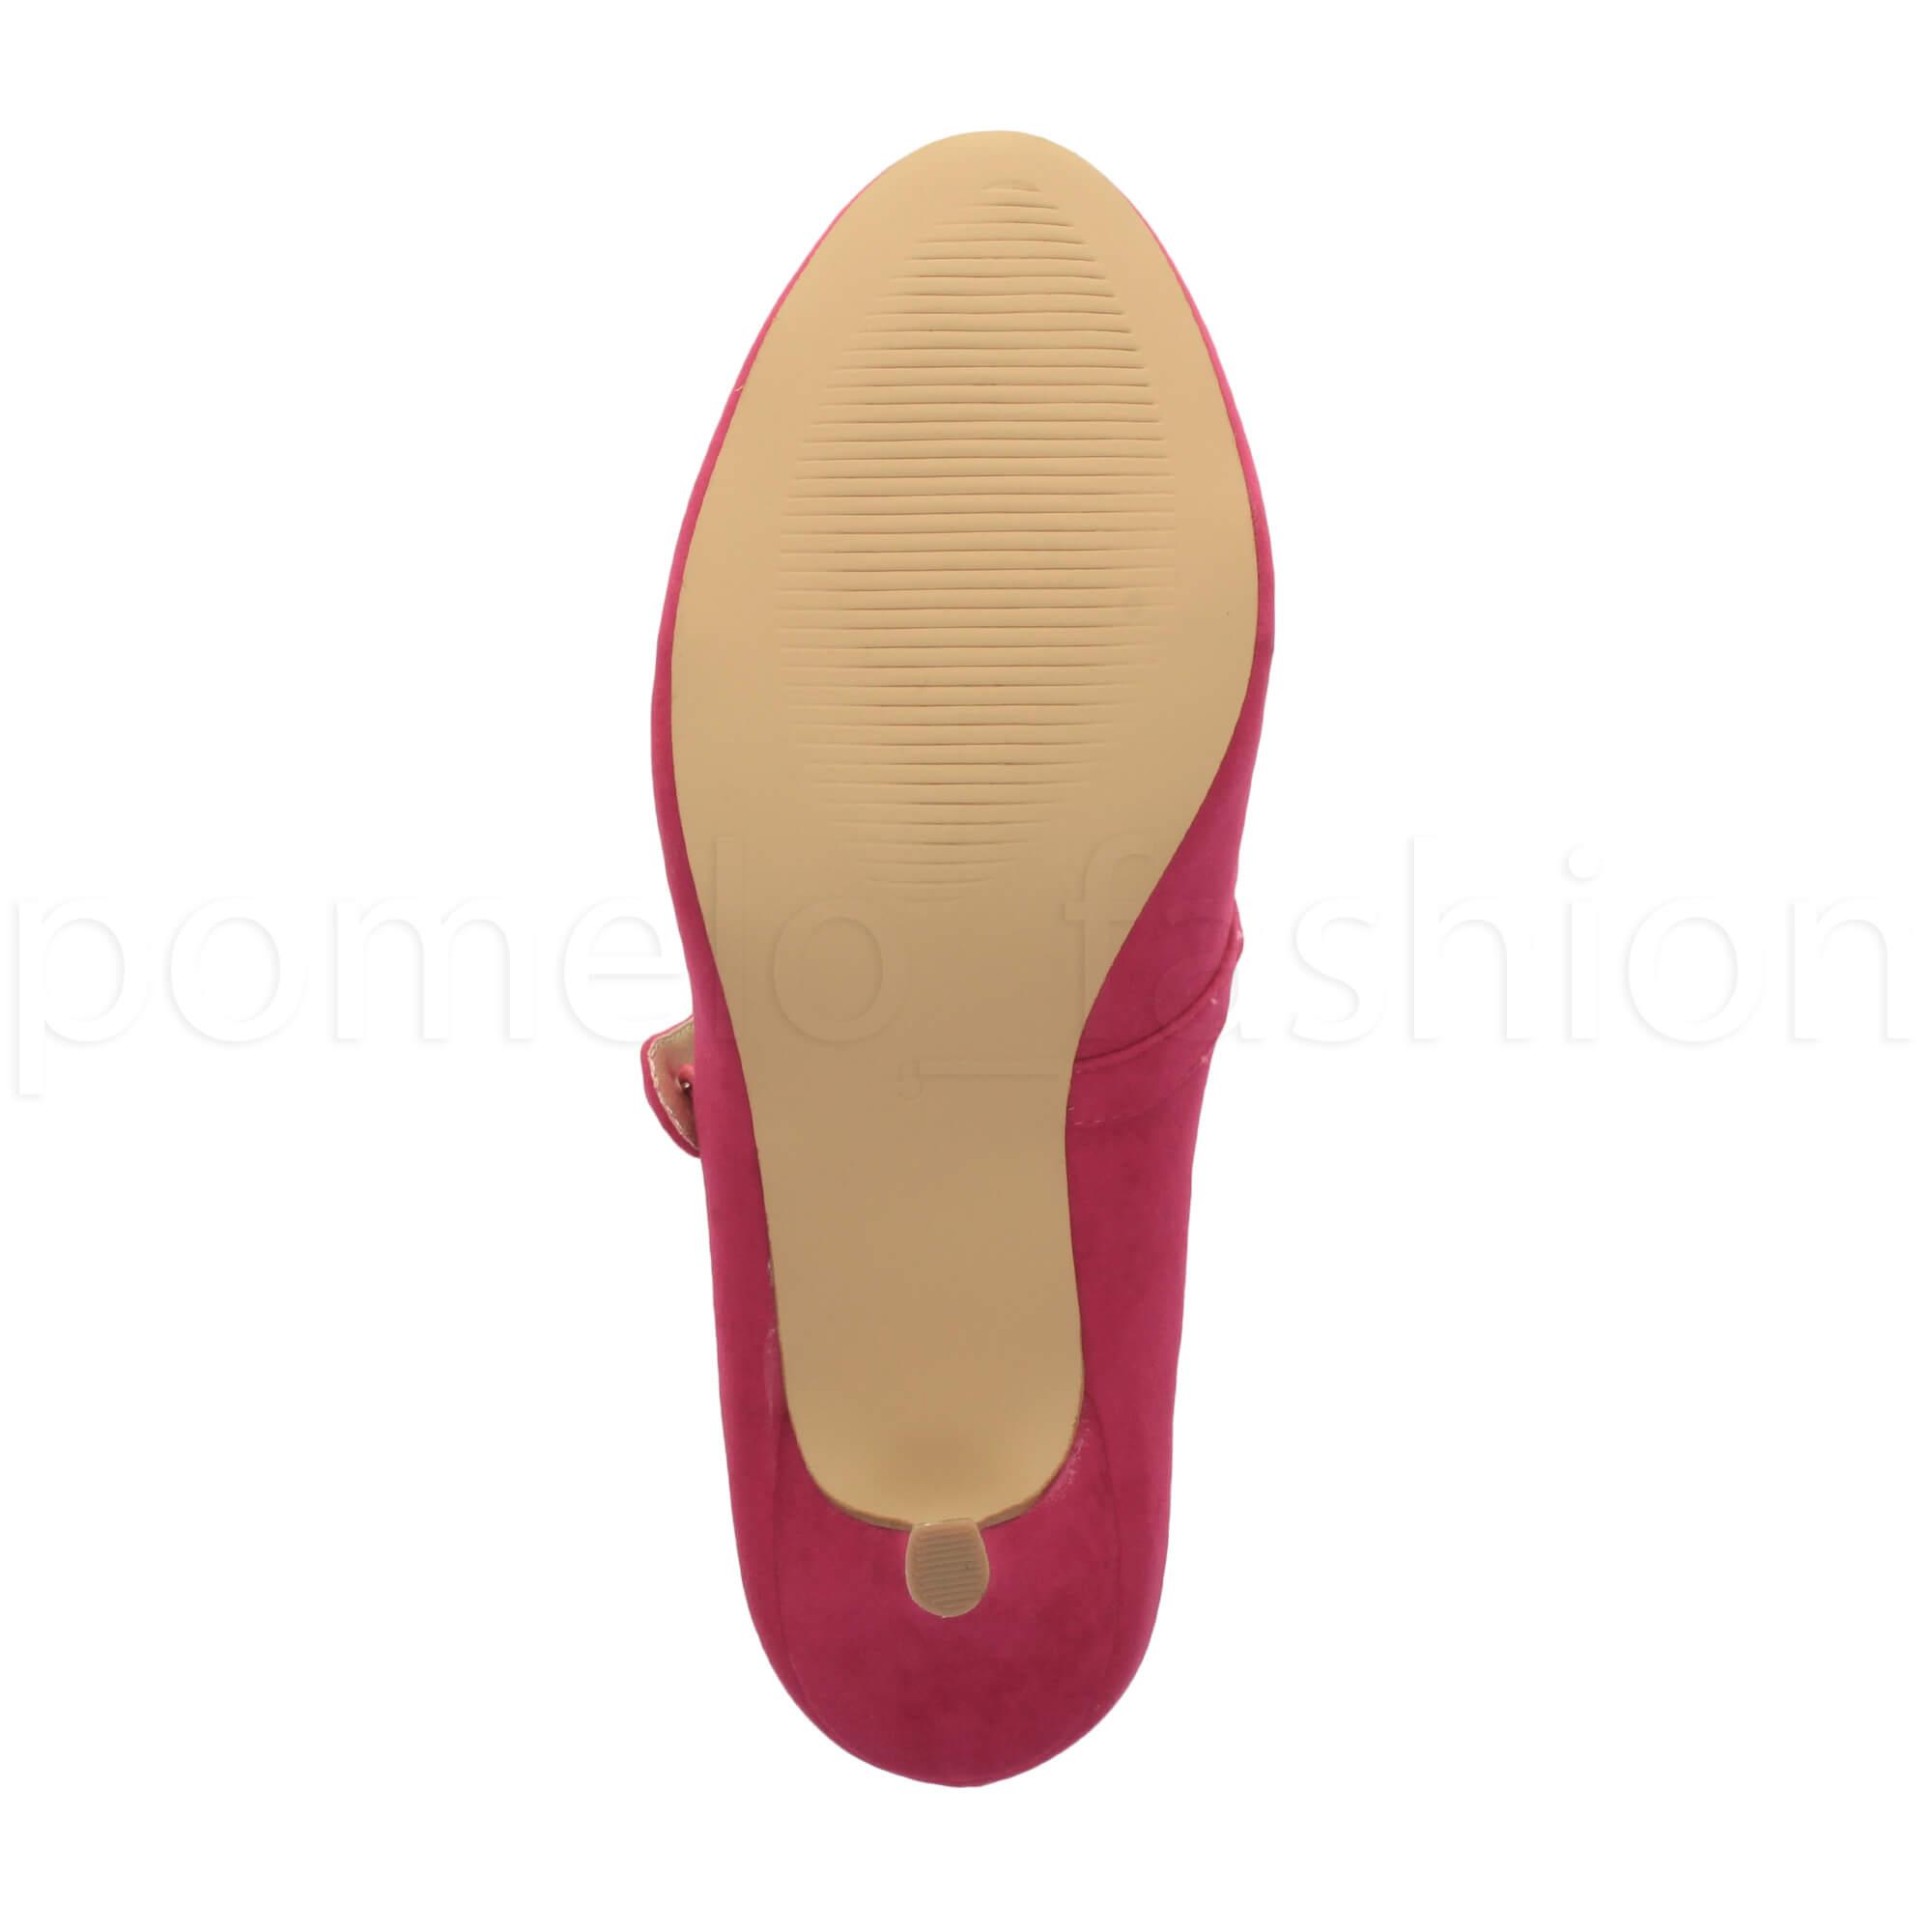 miniatura 64 - Donna basso tacco medio Mary Jane Damigella Matrimonio Pompe Scarpe Da Sera Taglia